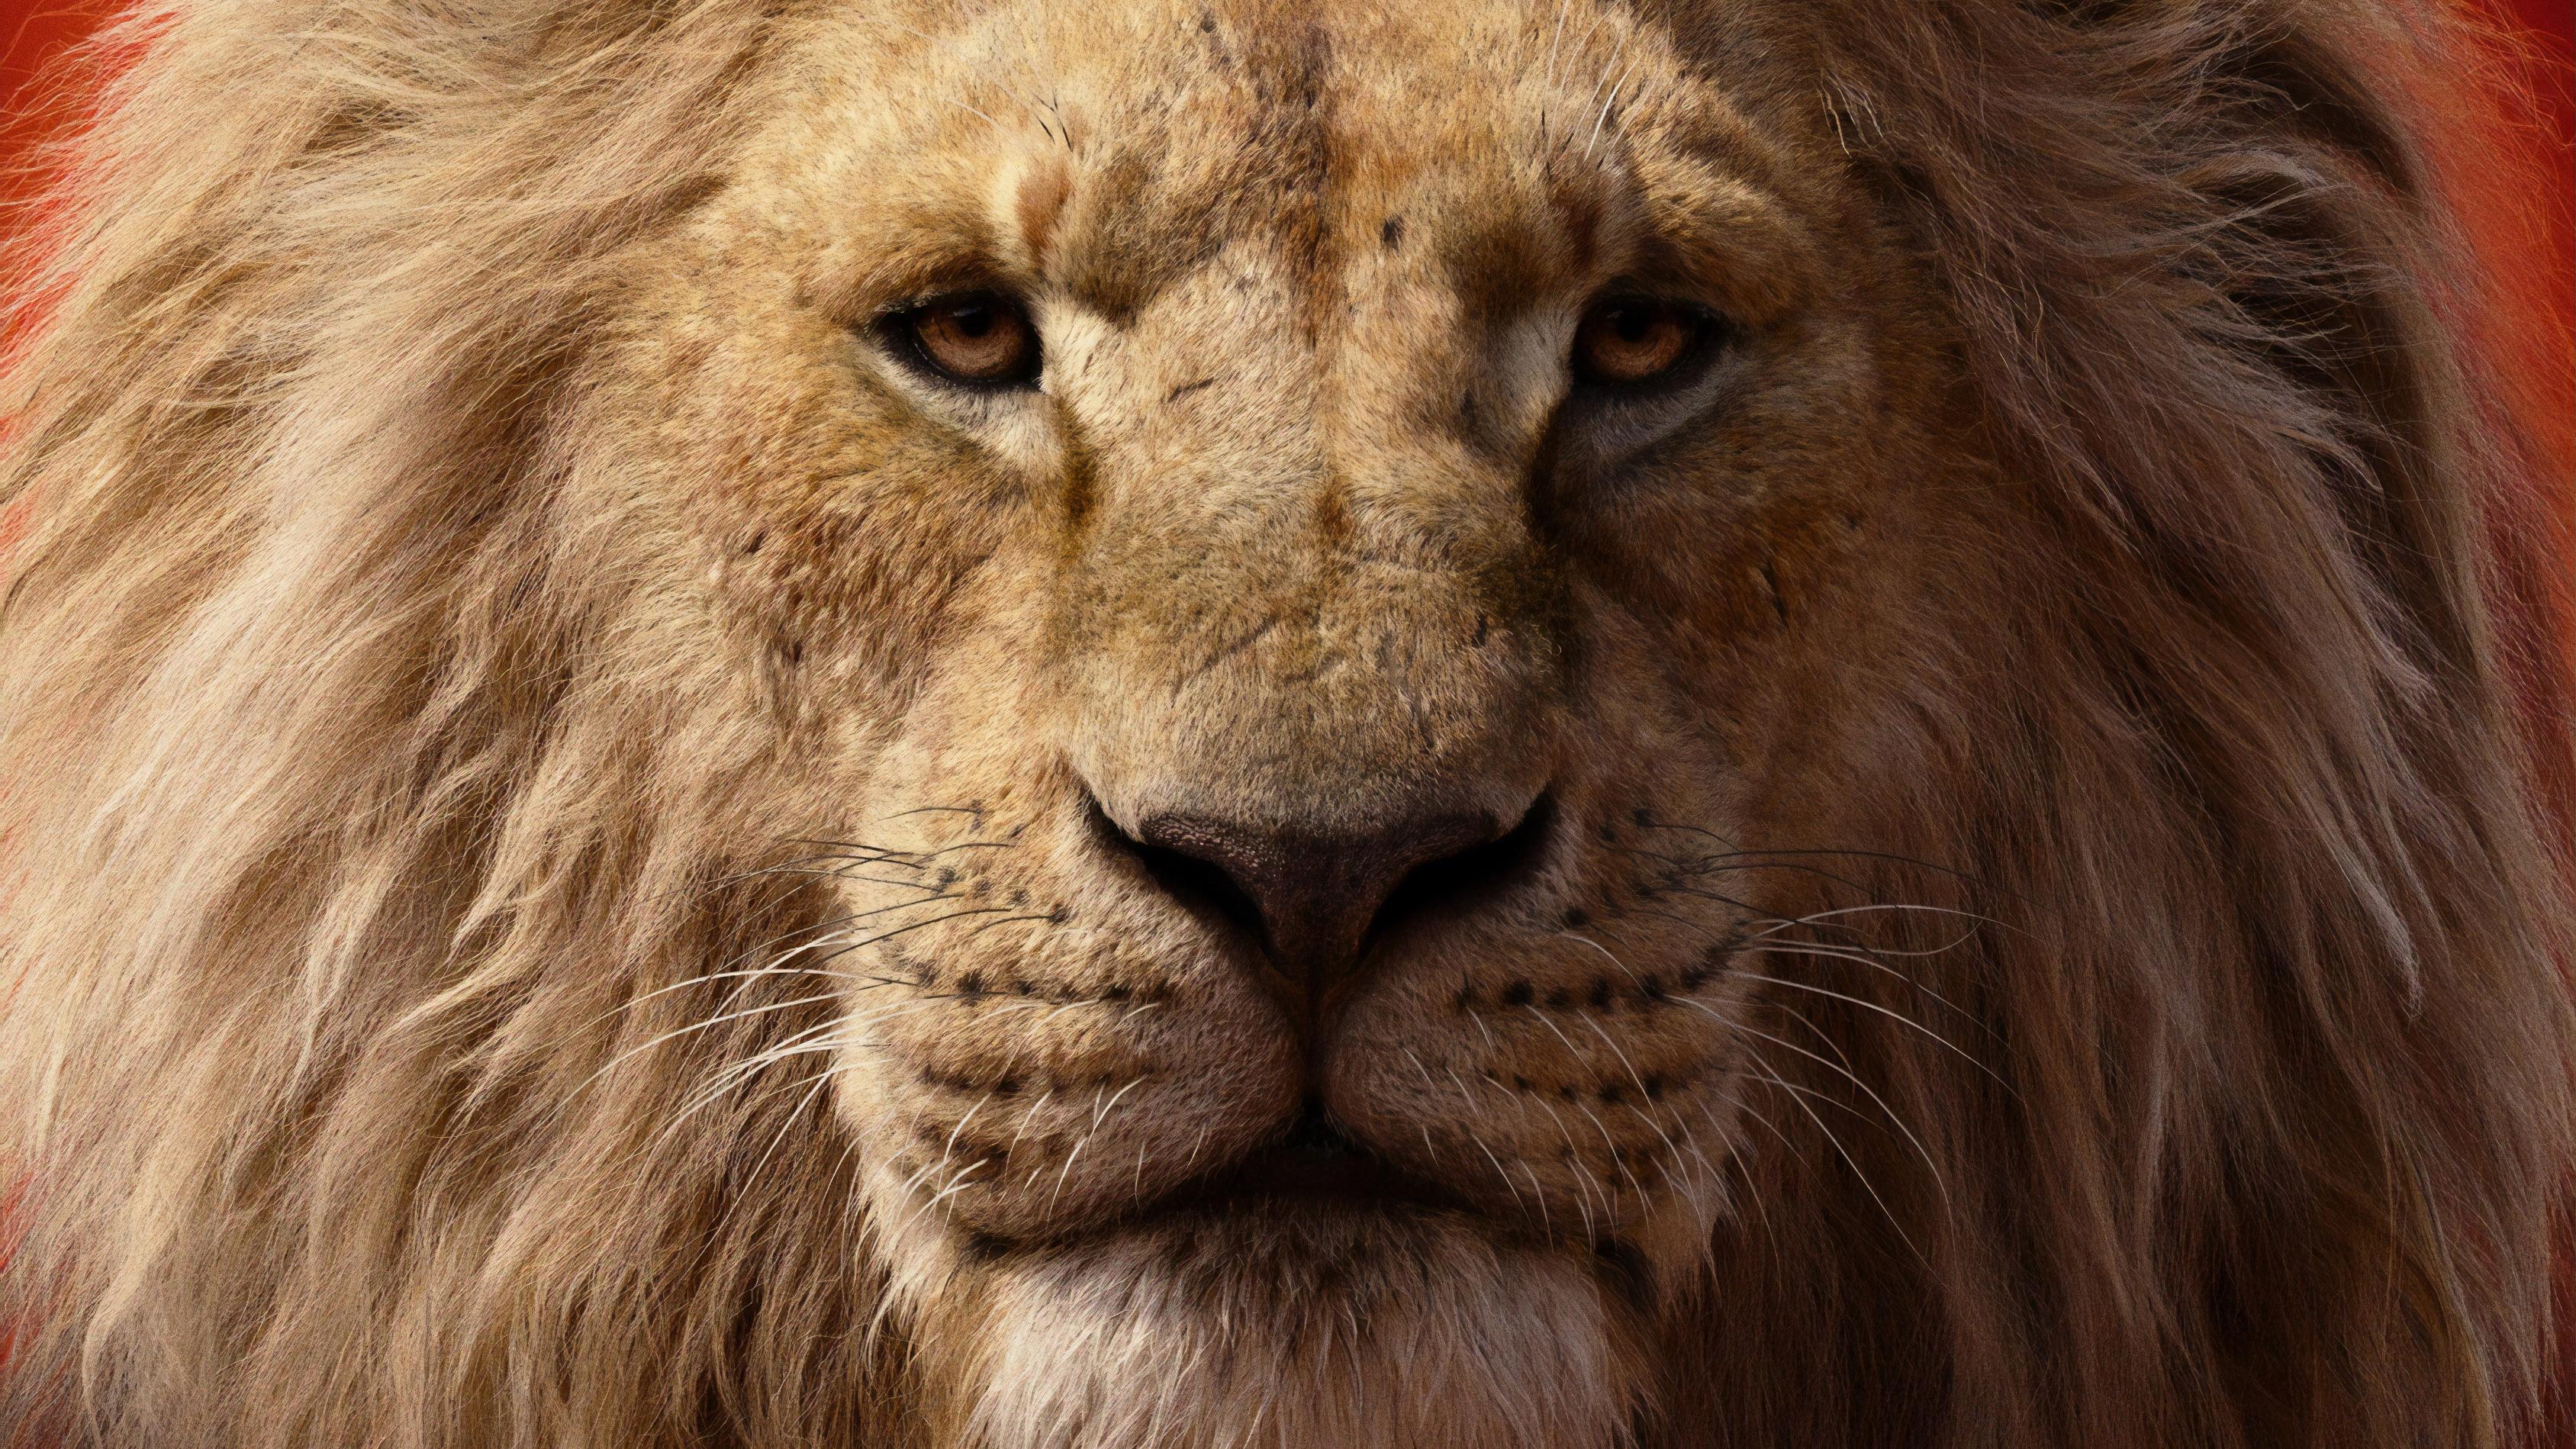 James Earl Jones As Mufasa The Lion King 2019 4k Hd Movies